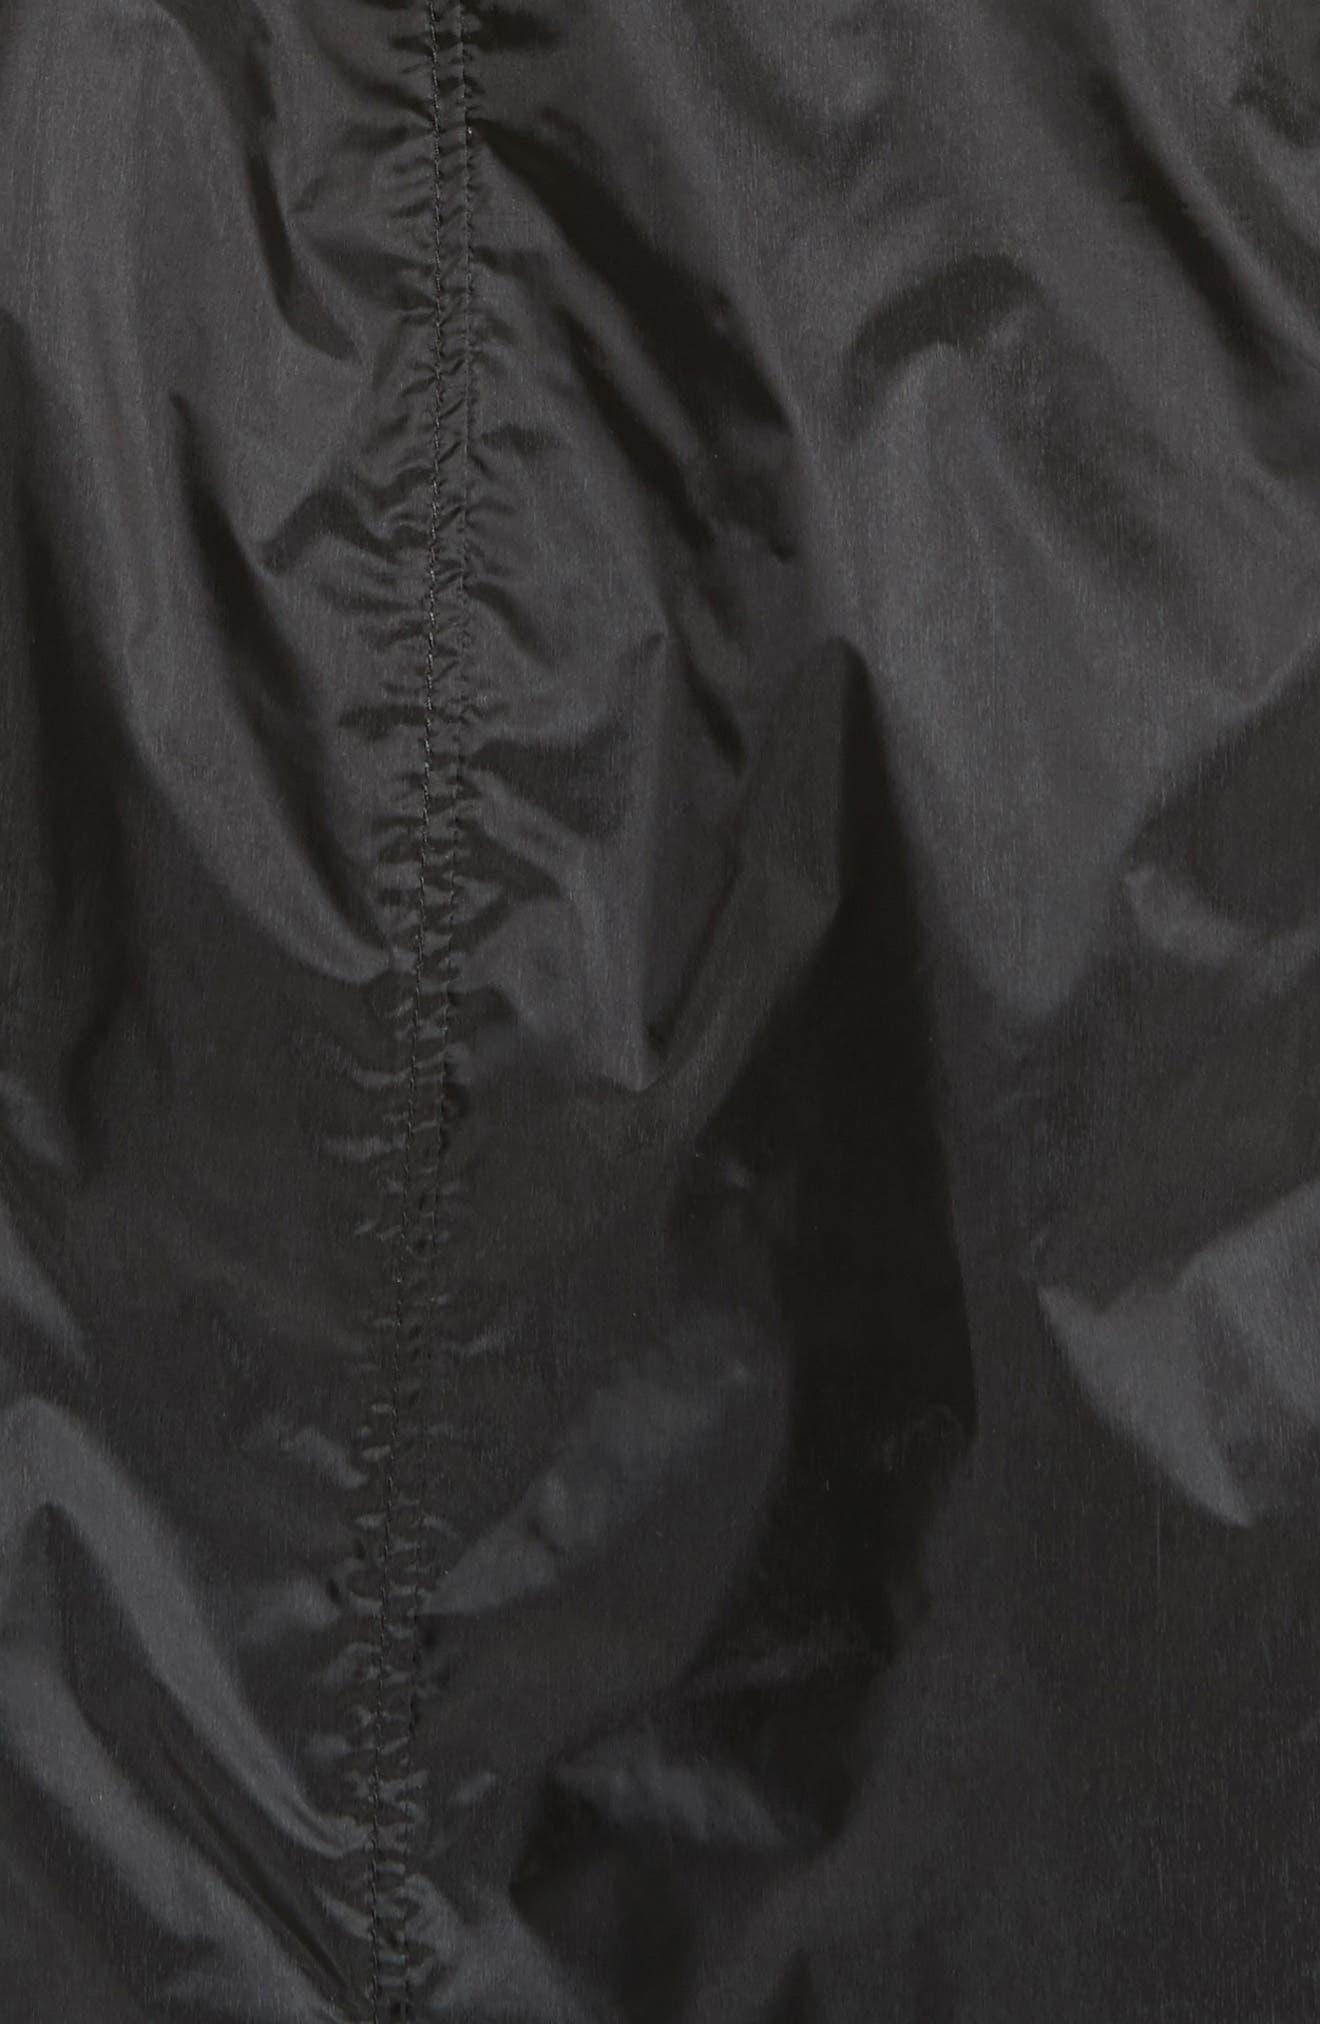 Kenwick Trench Coat,                             Alternate thumbnail 6, color,                             001